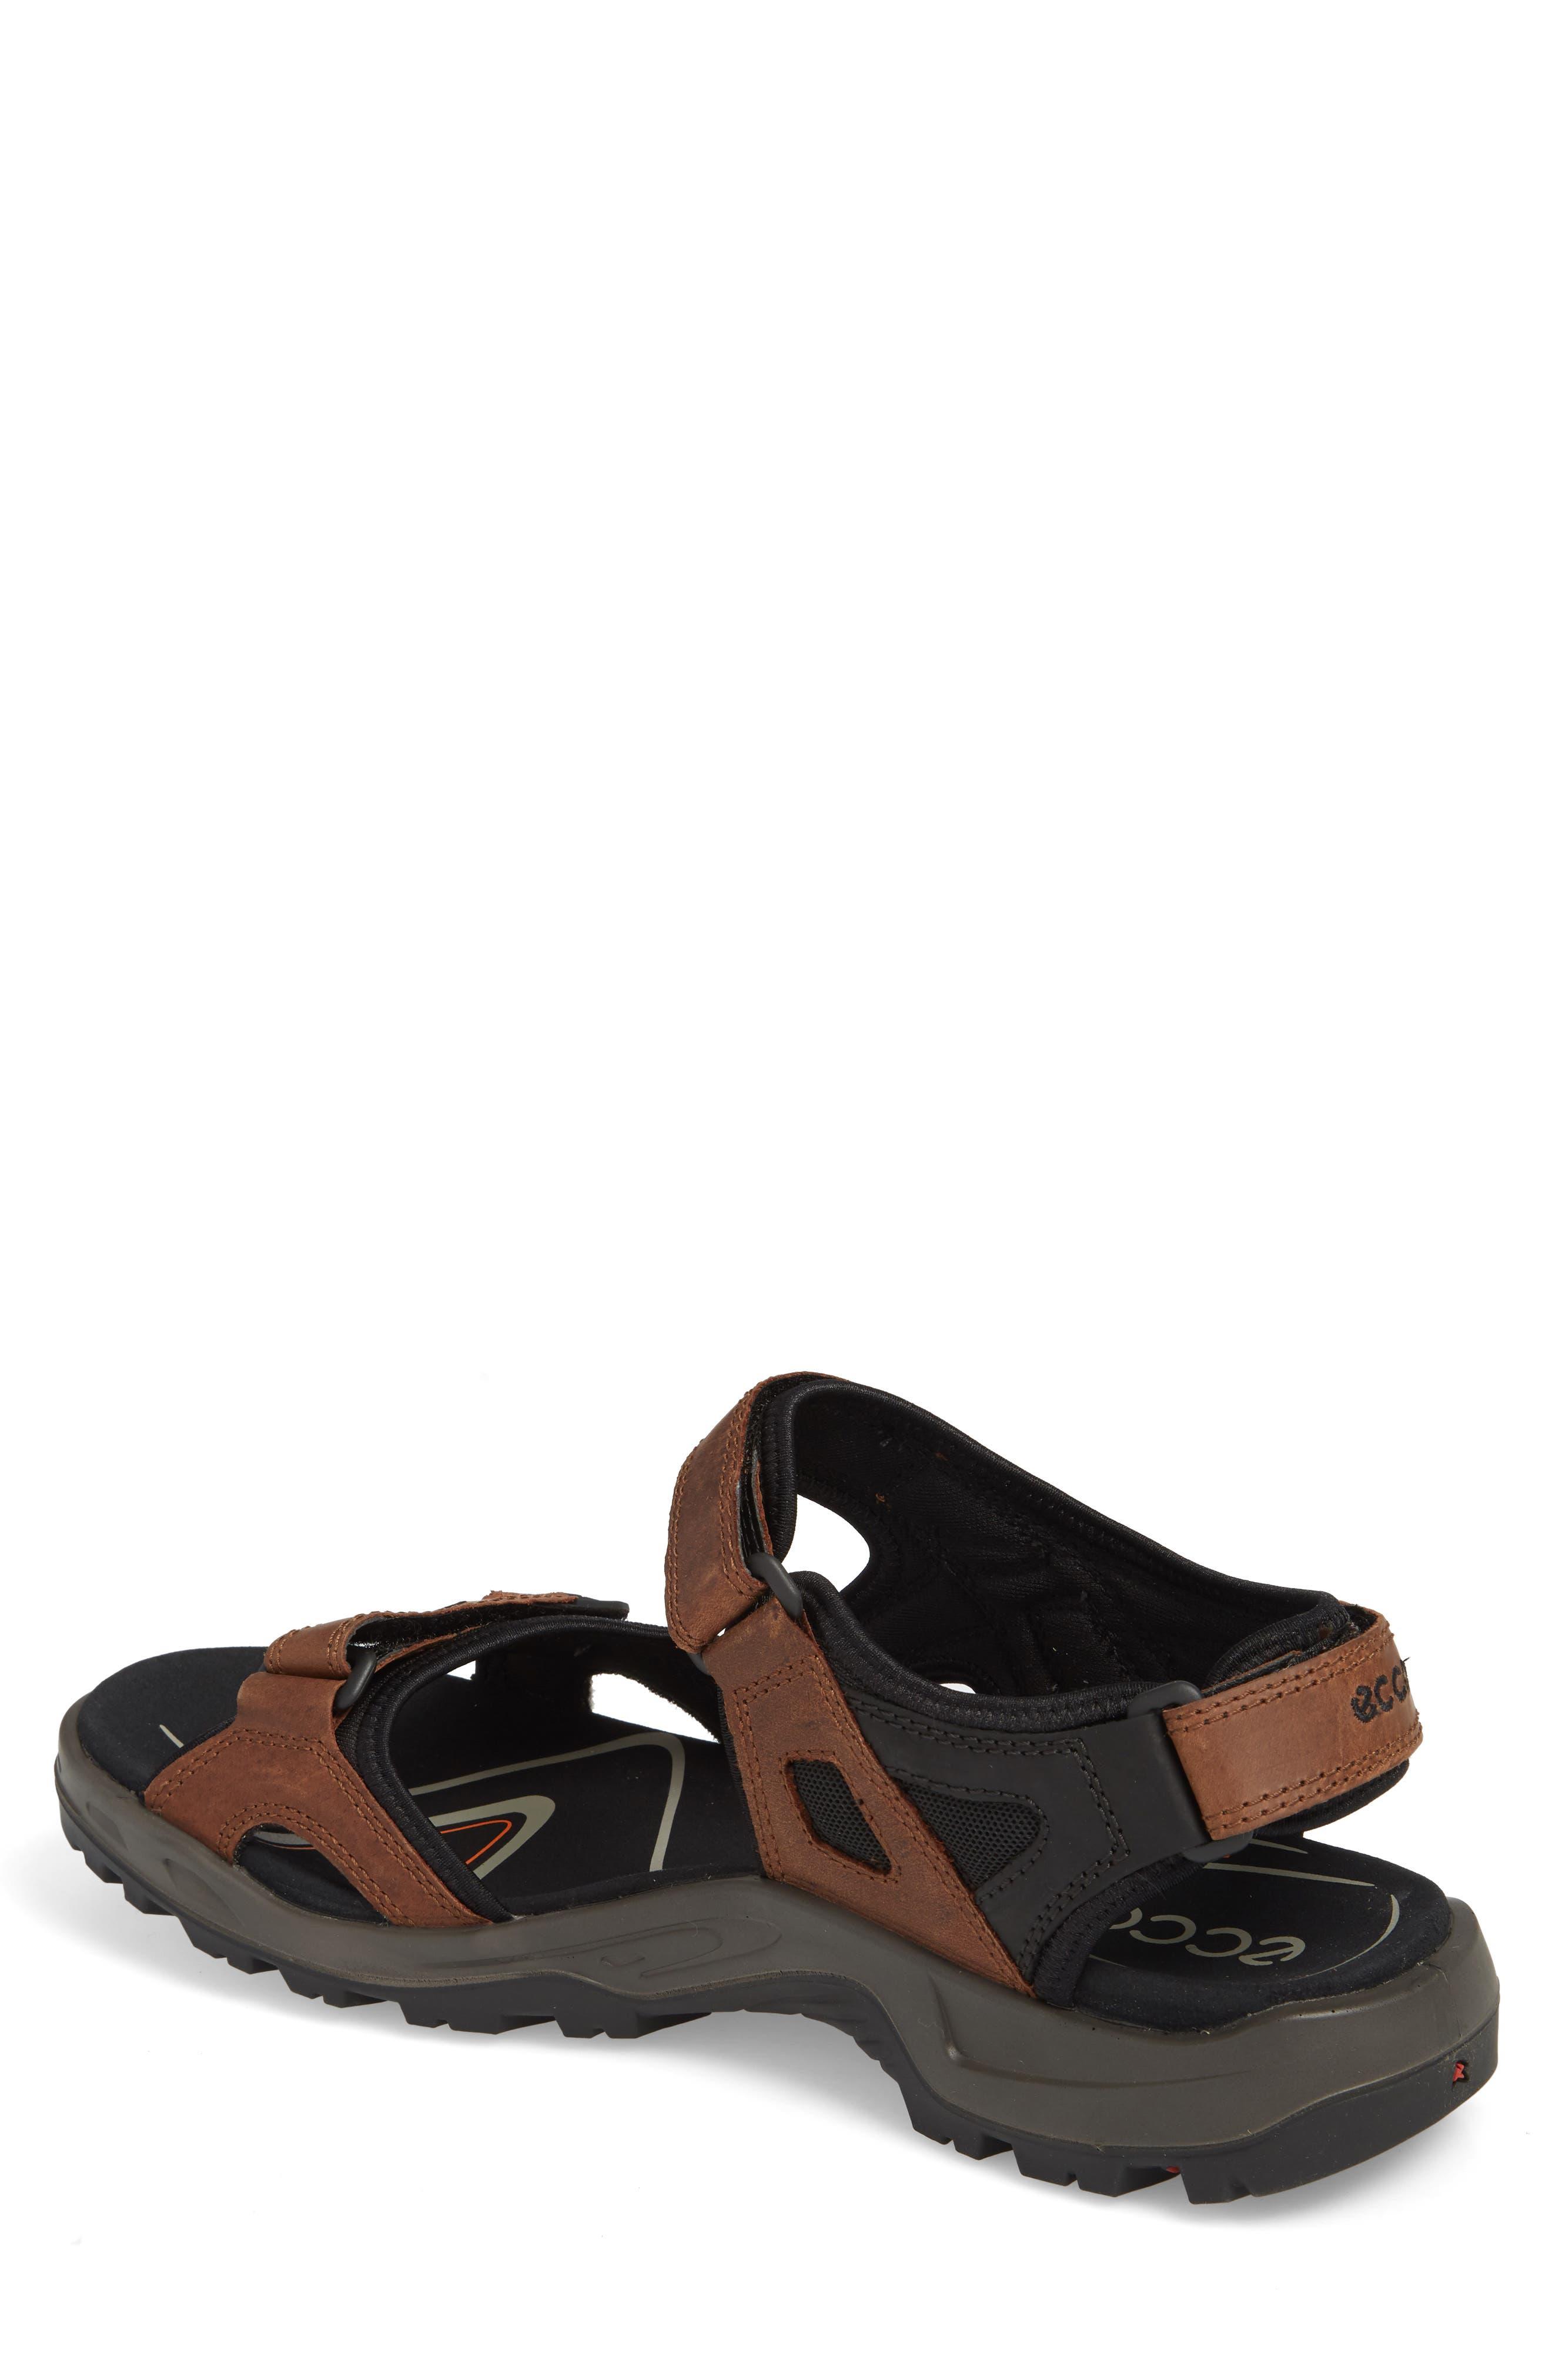 'Yucatan' Sandal,                             Alternate thumbnail 3, color,                             BROWN/BLACK